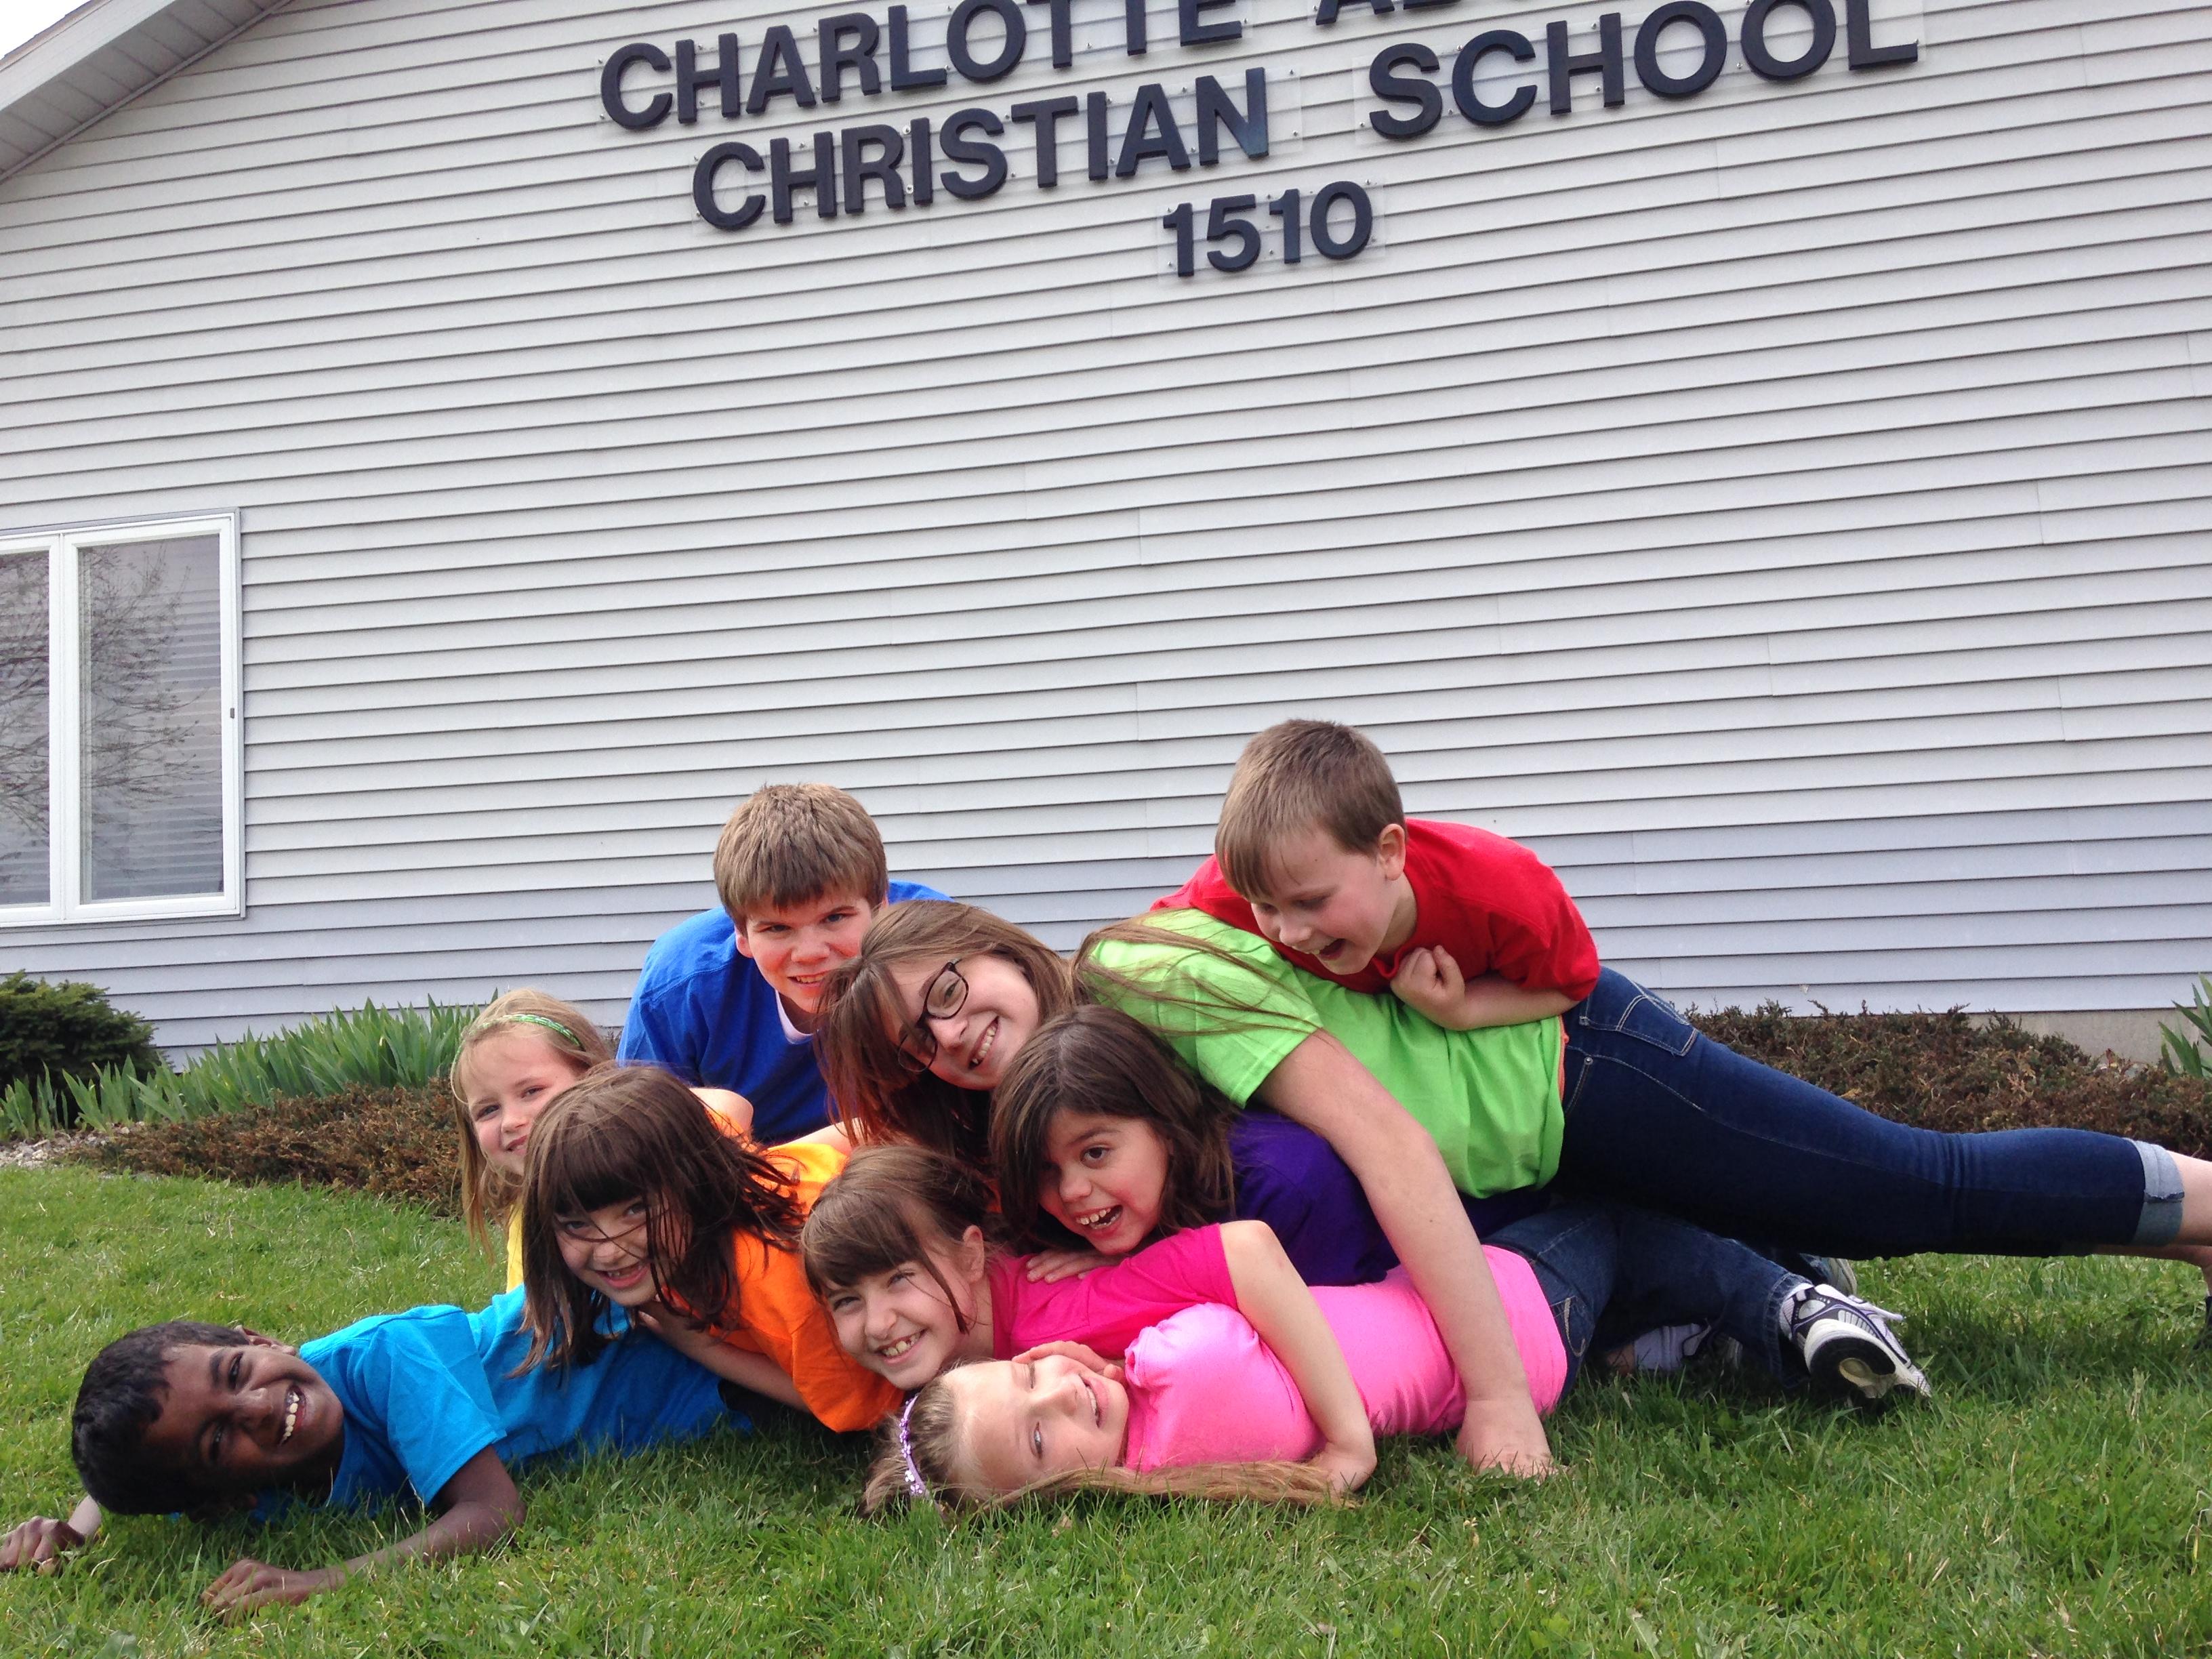 Charlotte Seventh-day Adventist School